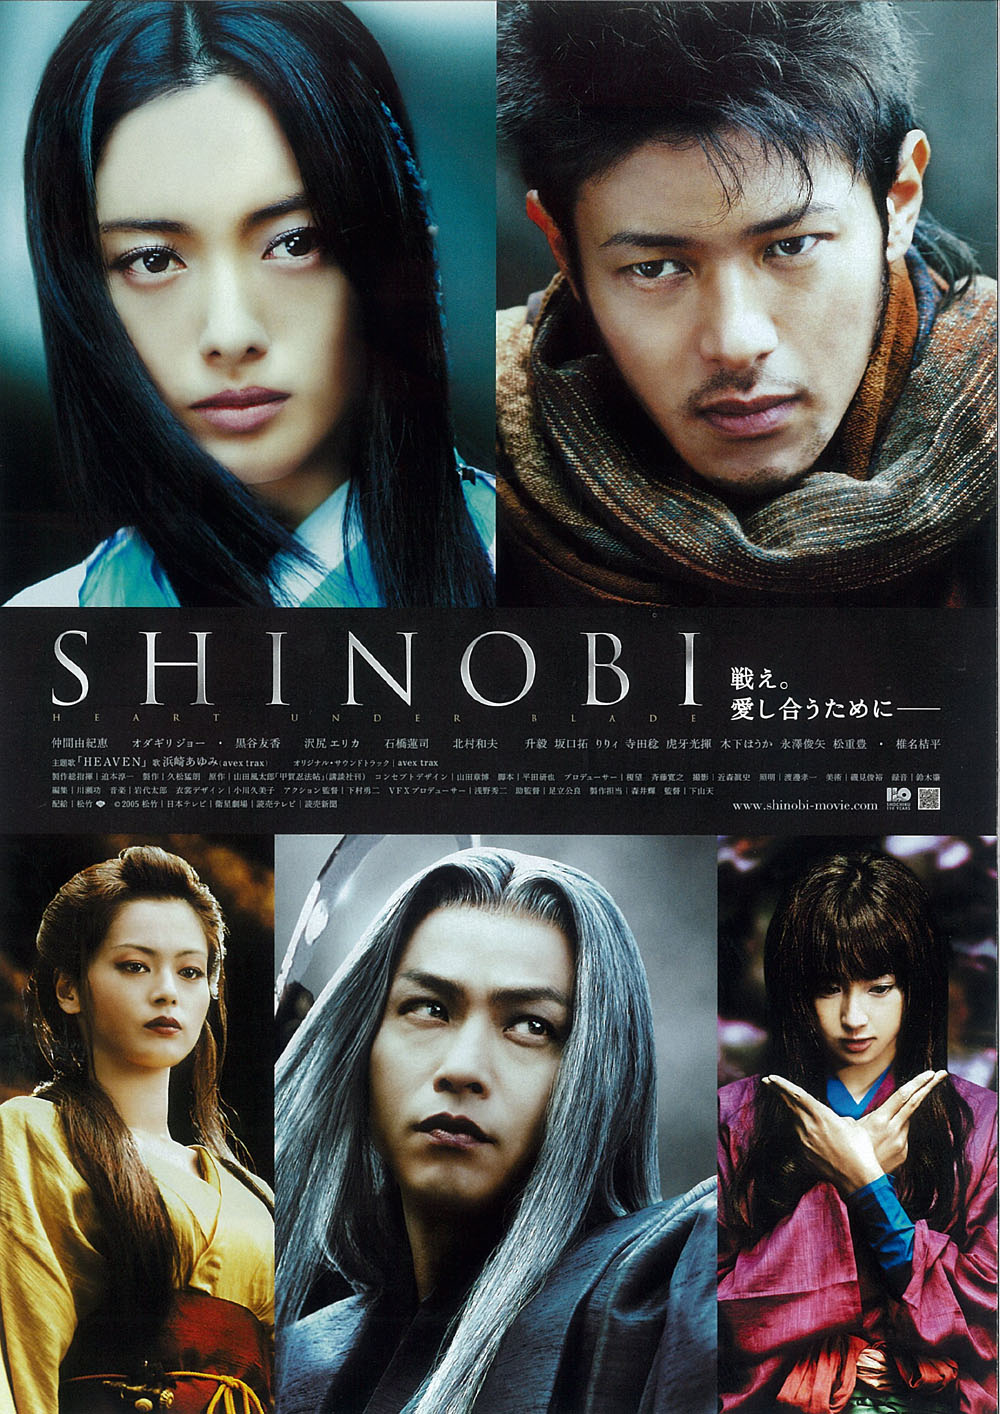 [Imagen: Shinobi+(2005).jpg]